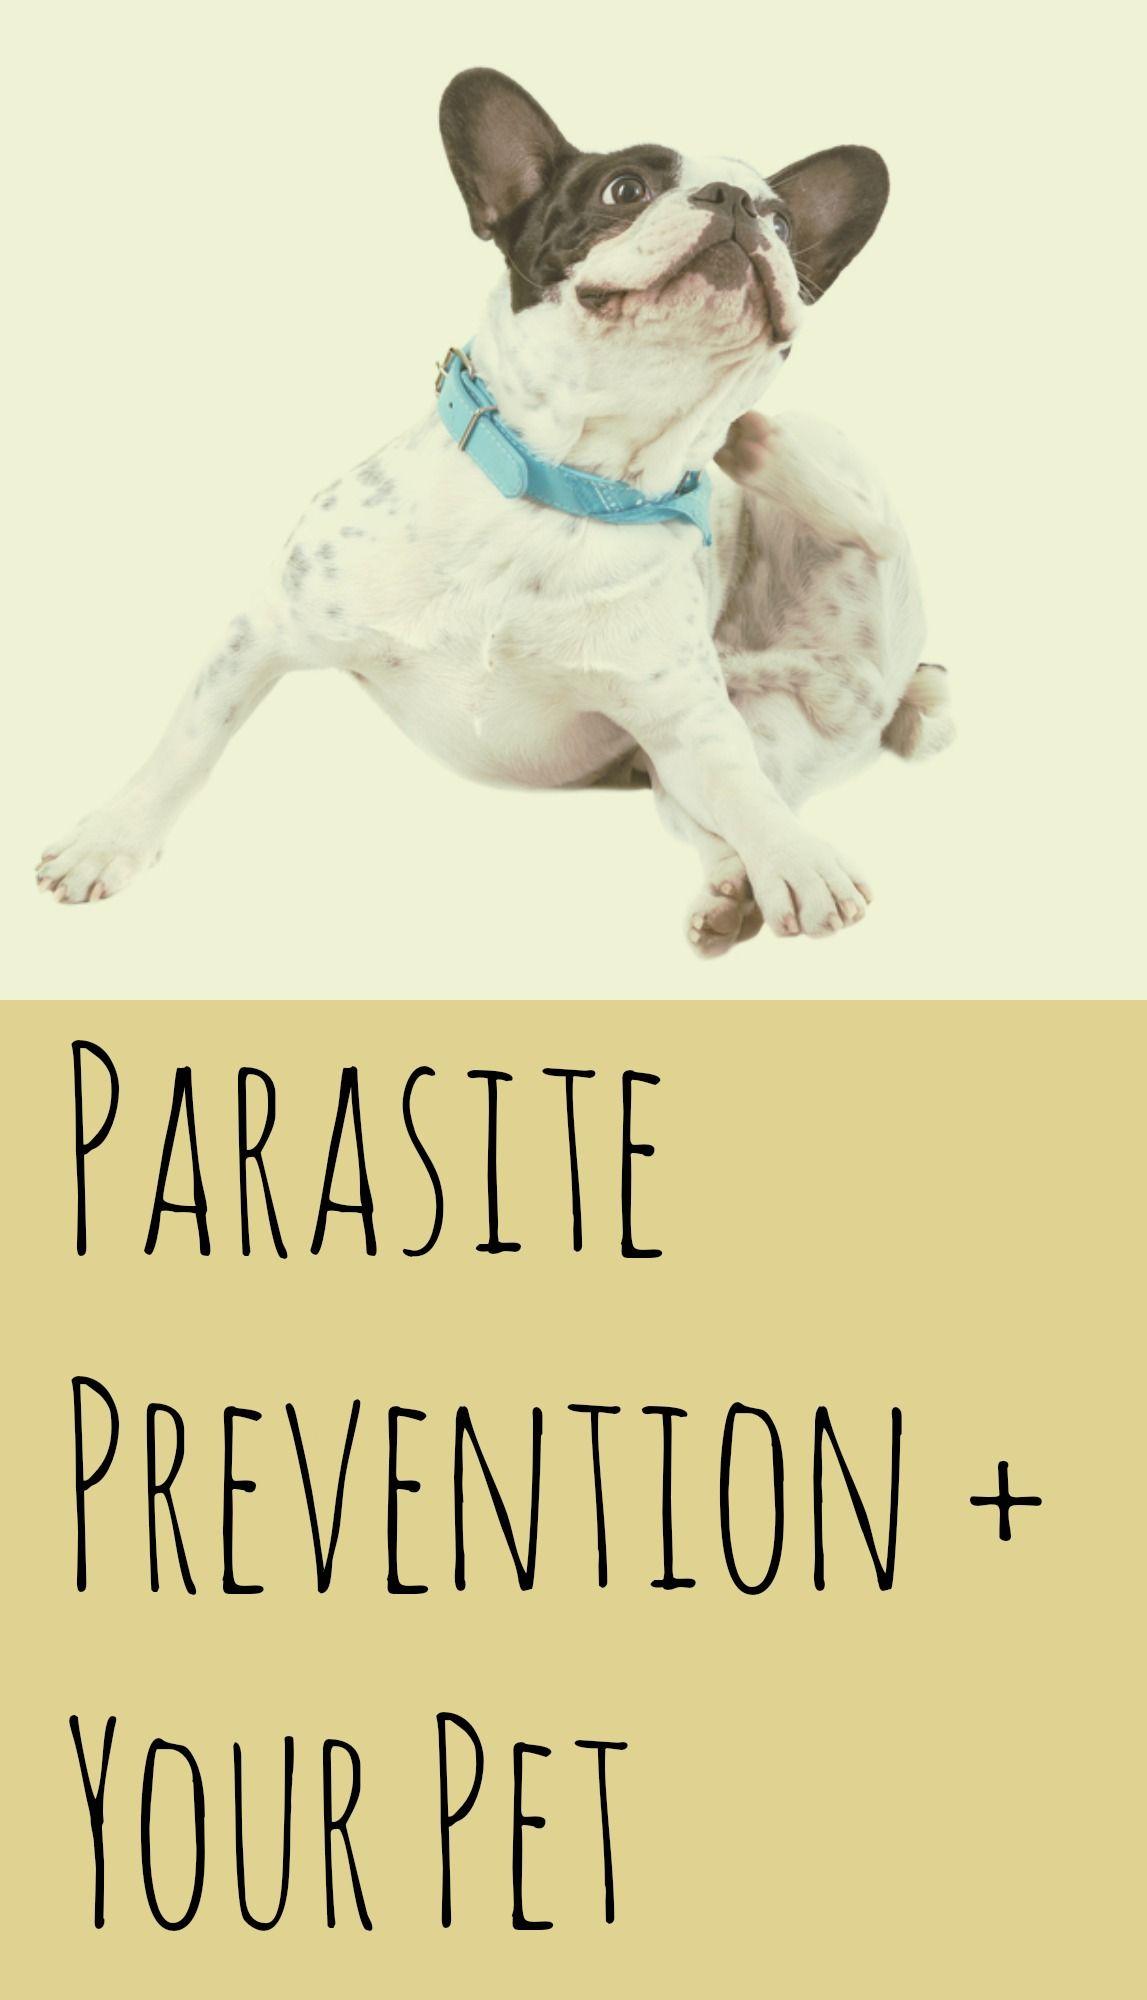 Parasite Prevention and Your Pet fleas pets pethealth